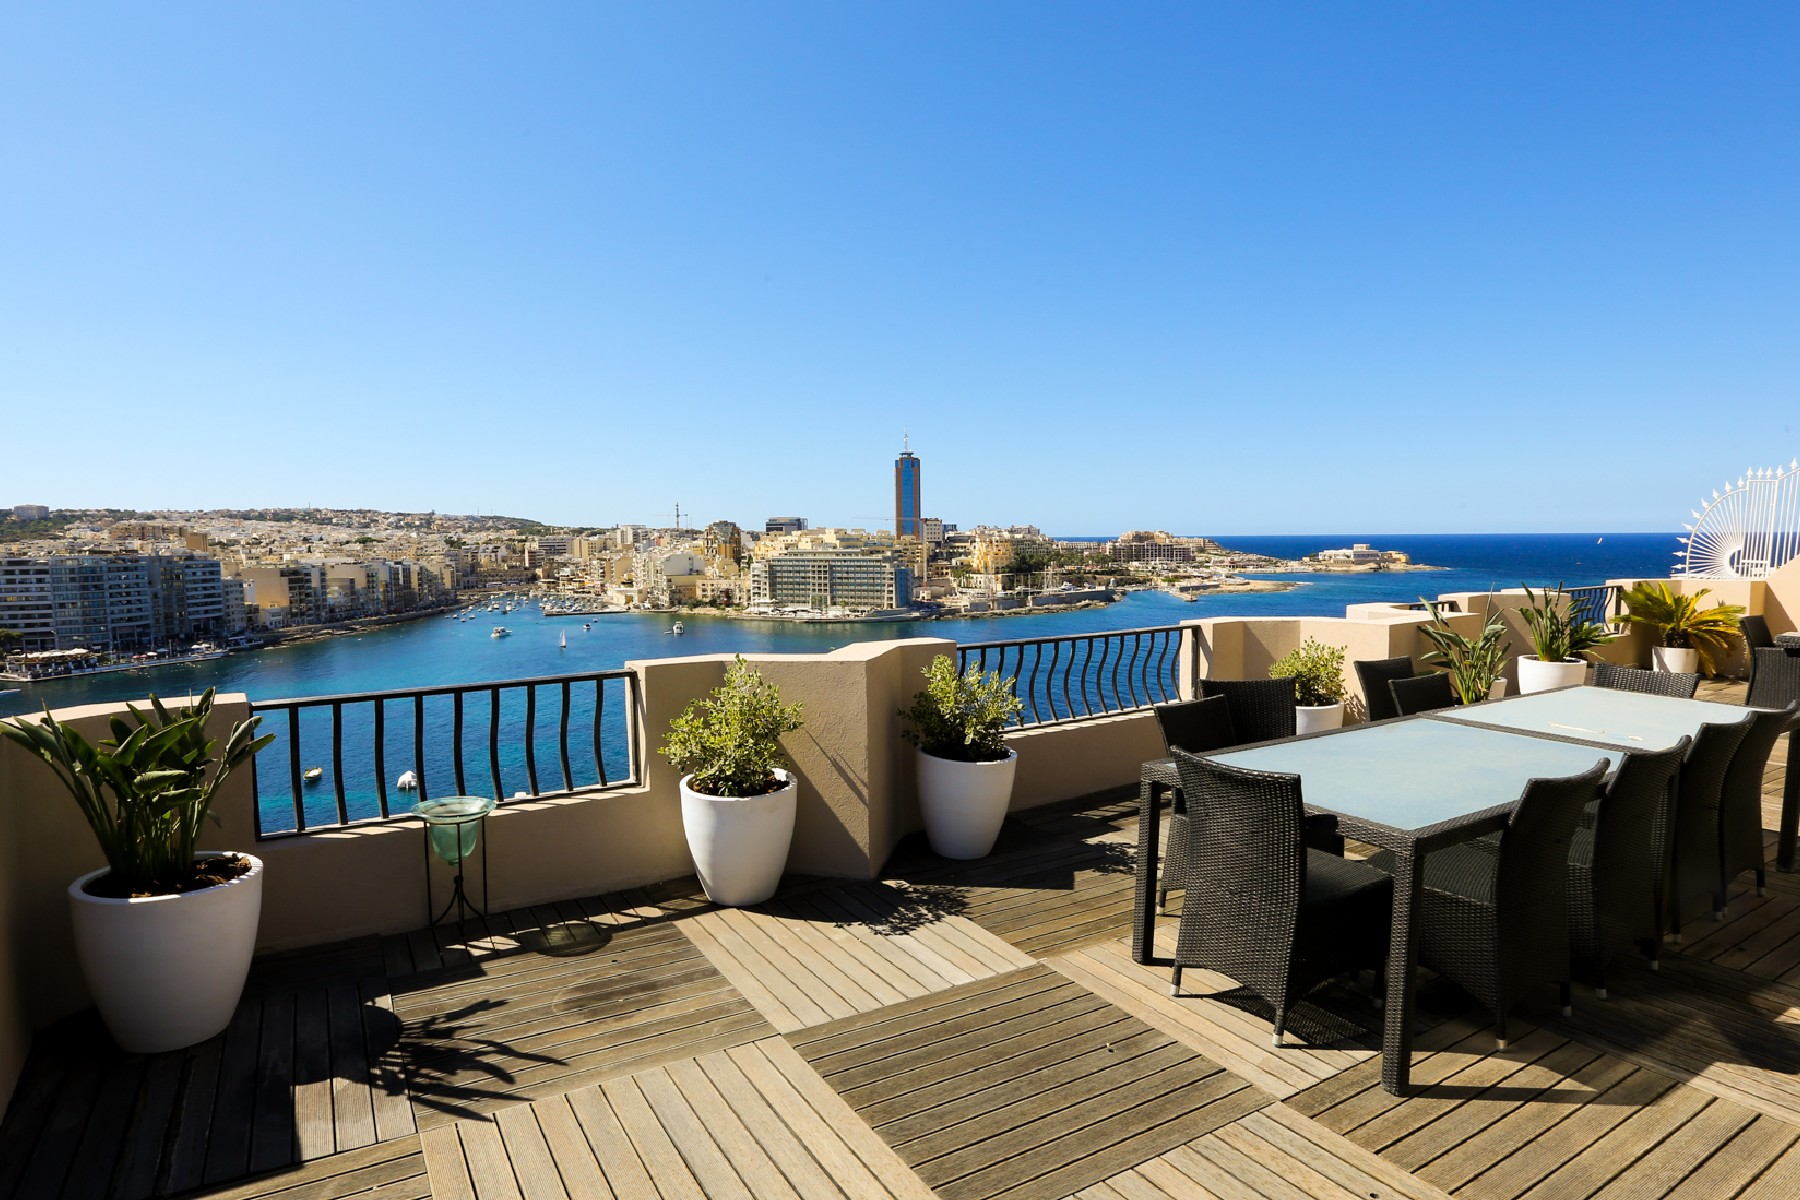 شقة للـ Rent في Luxurious Penthouse With Stunning Views Sliema, Malta